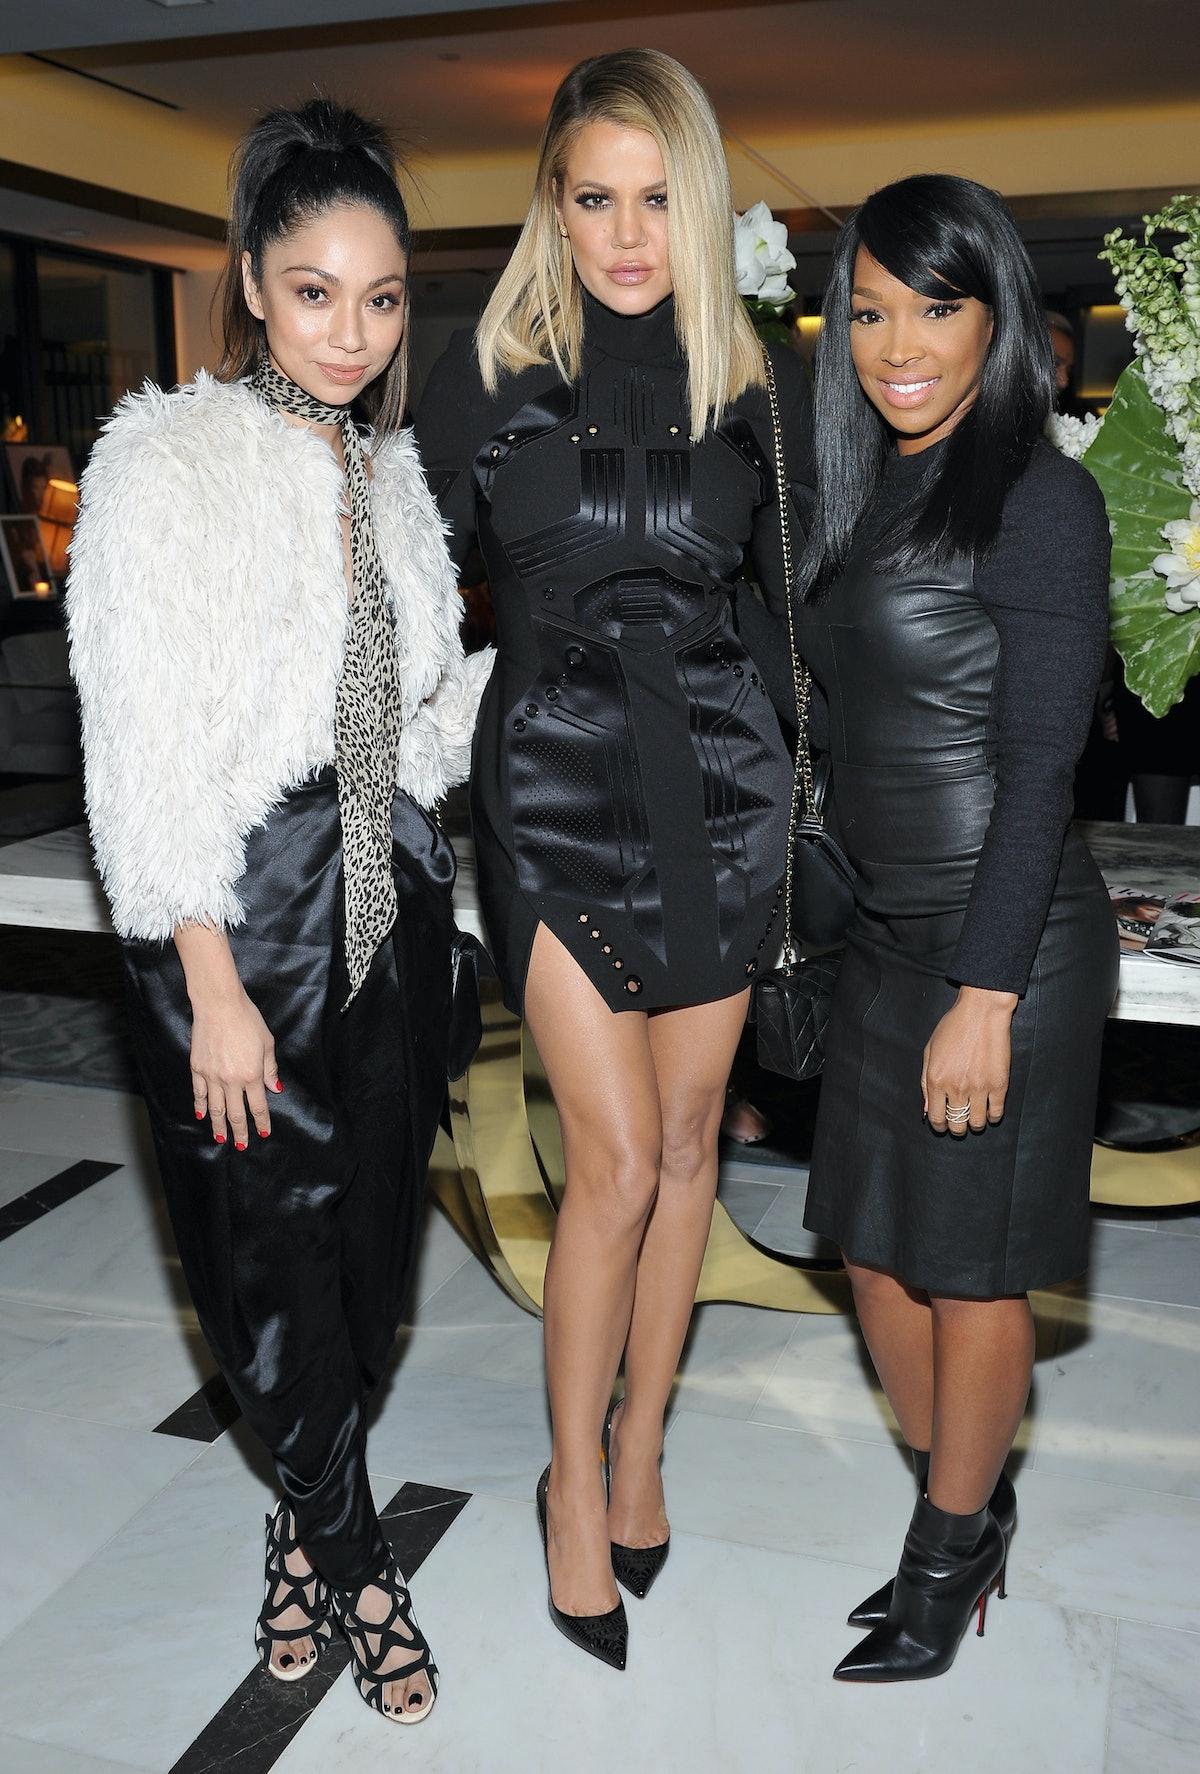 Khloe Kardashian and Monica Rose